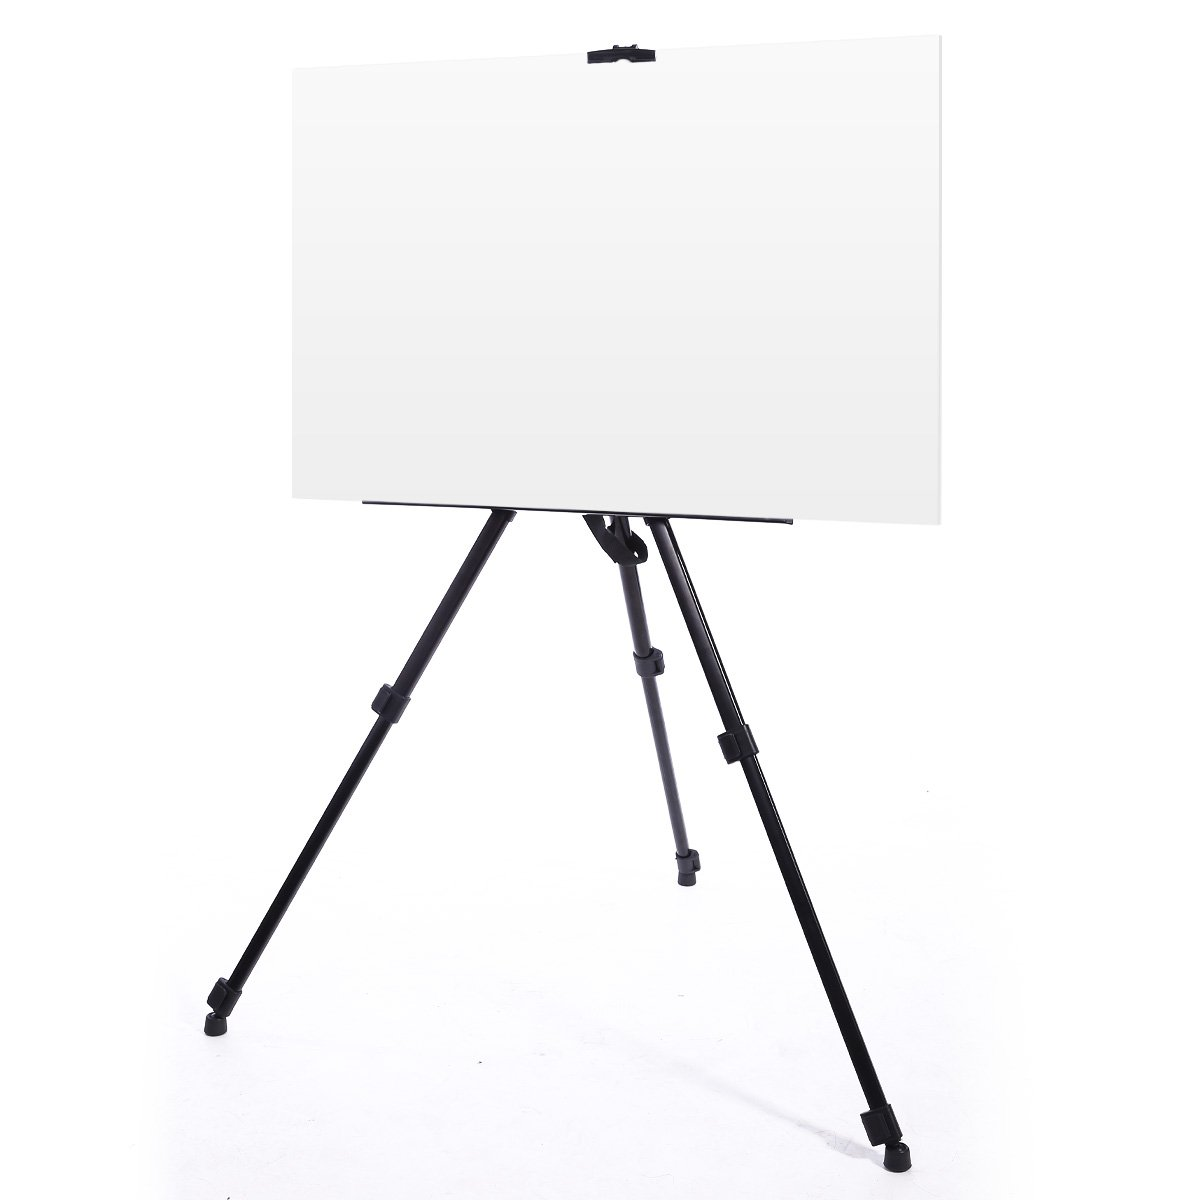 Anladia Artist Field Studio - Trí pode de Caballete para Tablero Blanco